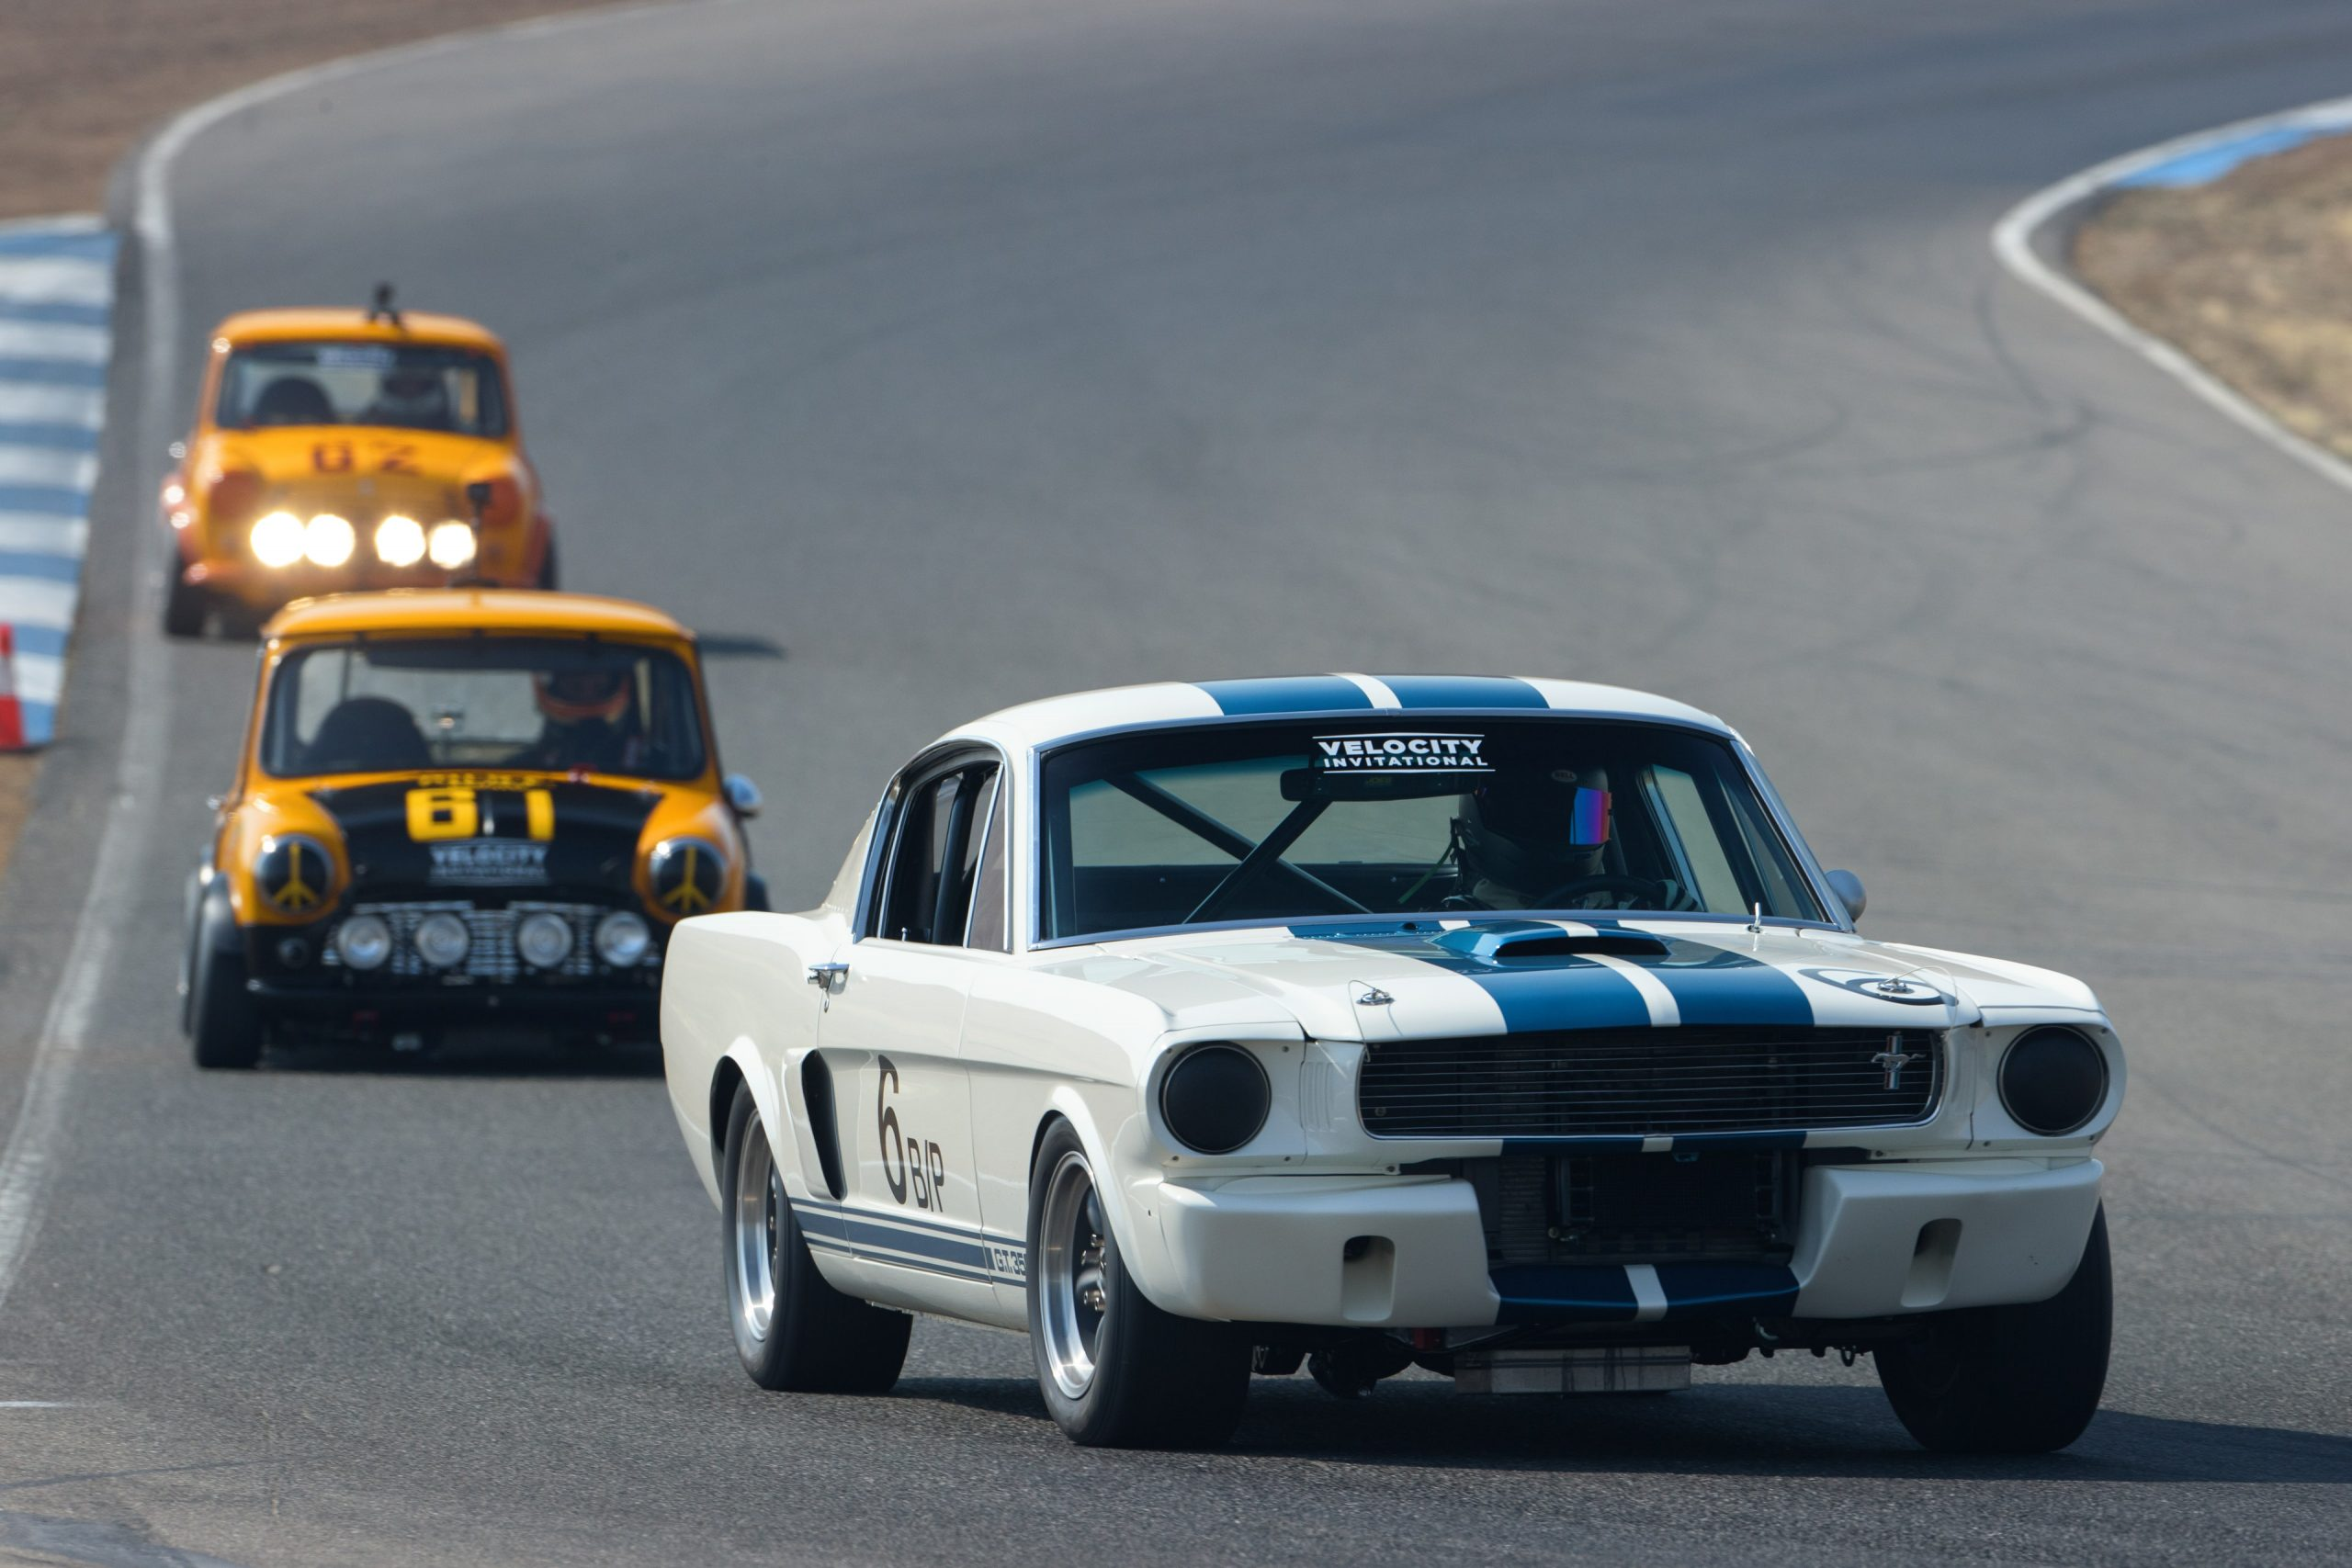 Mini Vs Mustang Night Race from Kahn Media